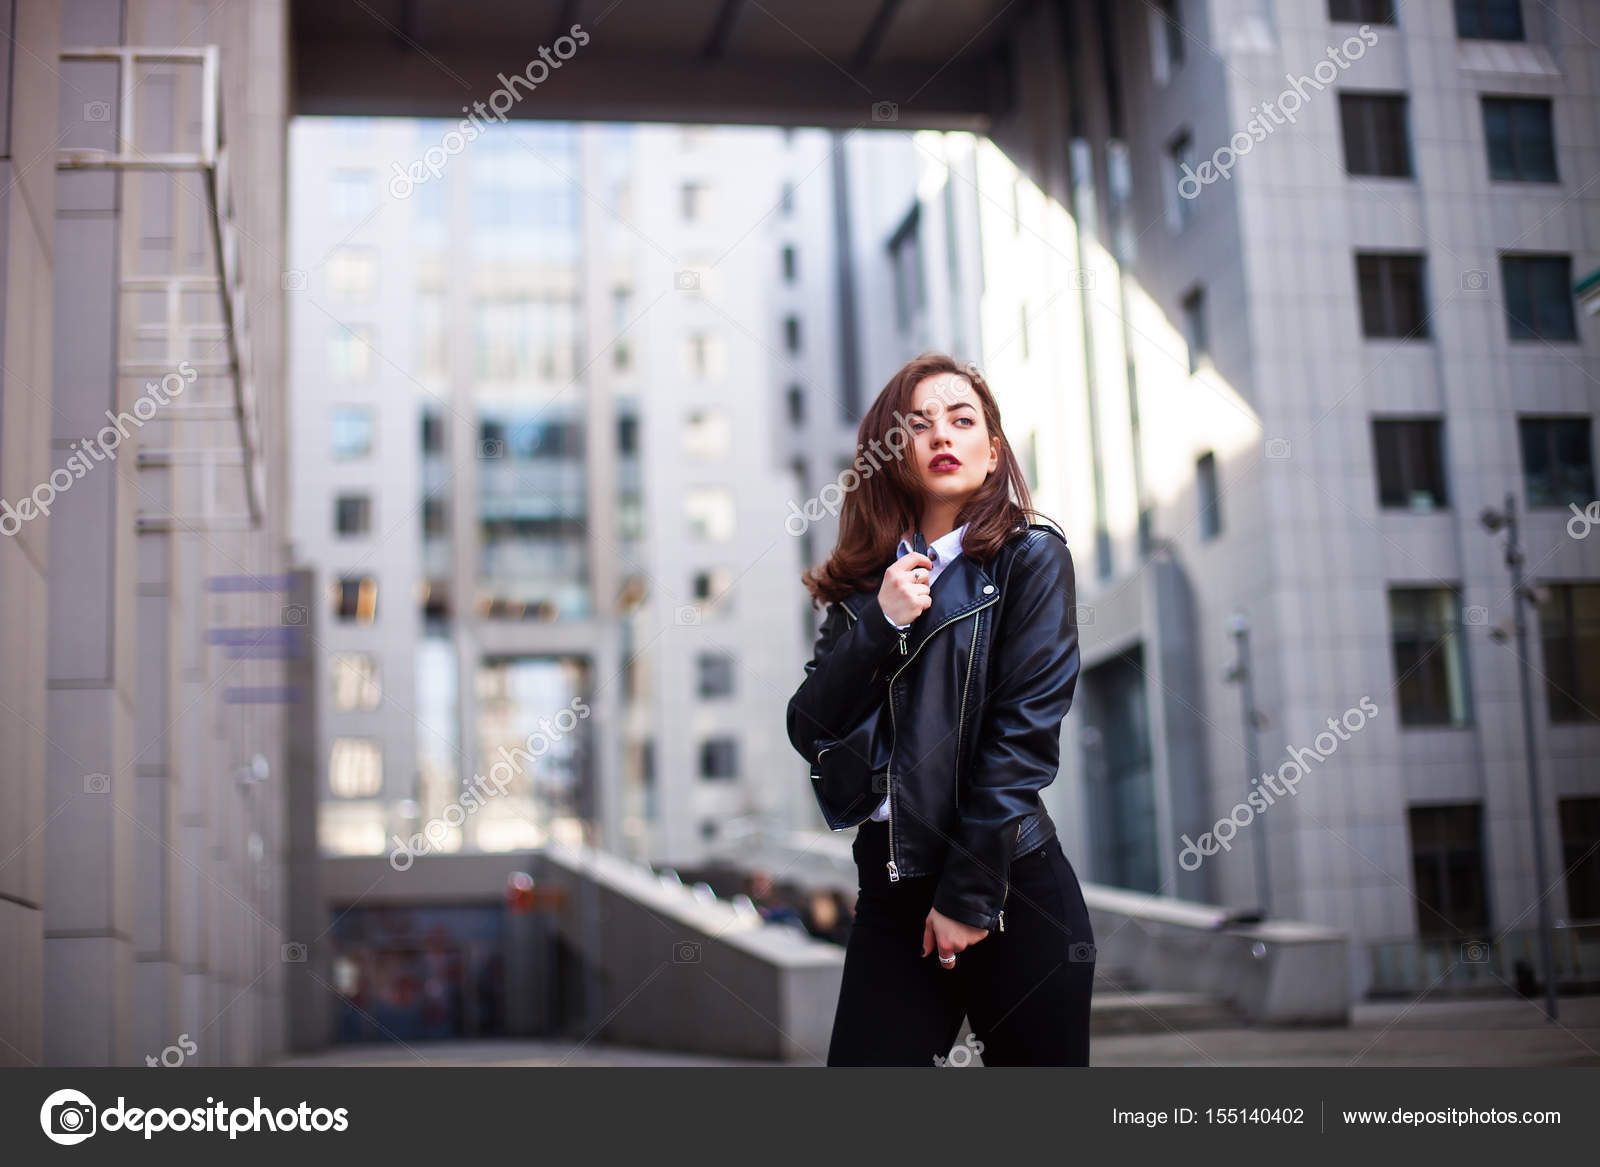 Piel Hipster Al Mujer Libre Cabello De Posando Aire Moda Morena HcUAUWg